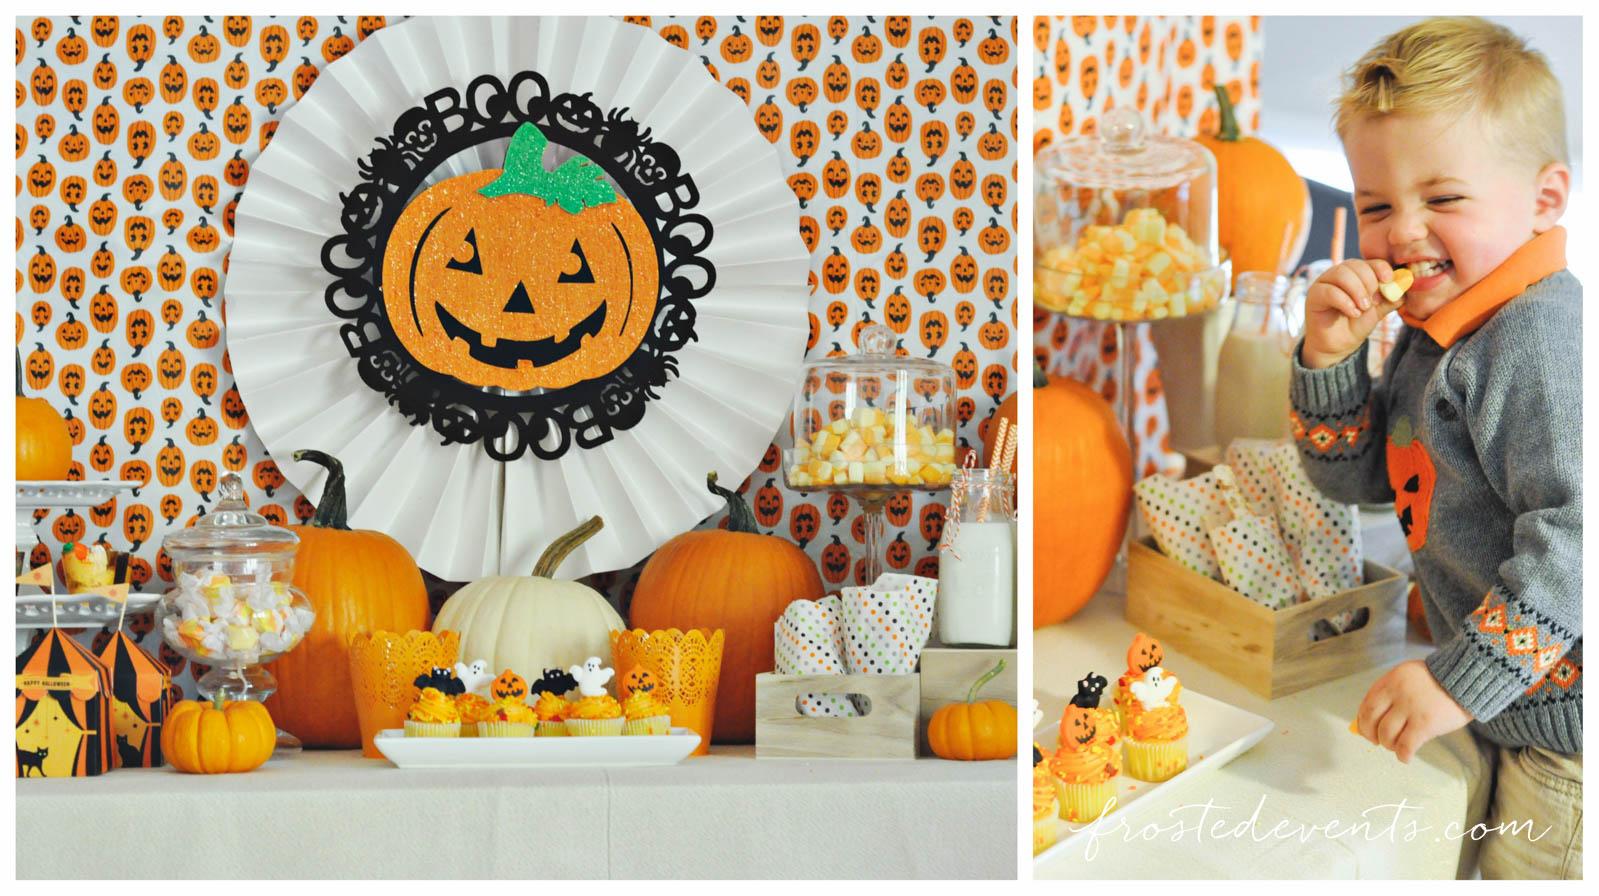 Halloween ideas for kids cute pumpkin party - Childrens halloween decorations ...